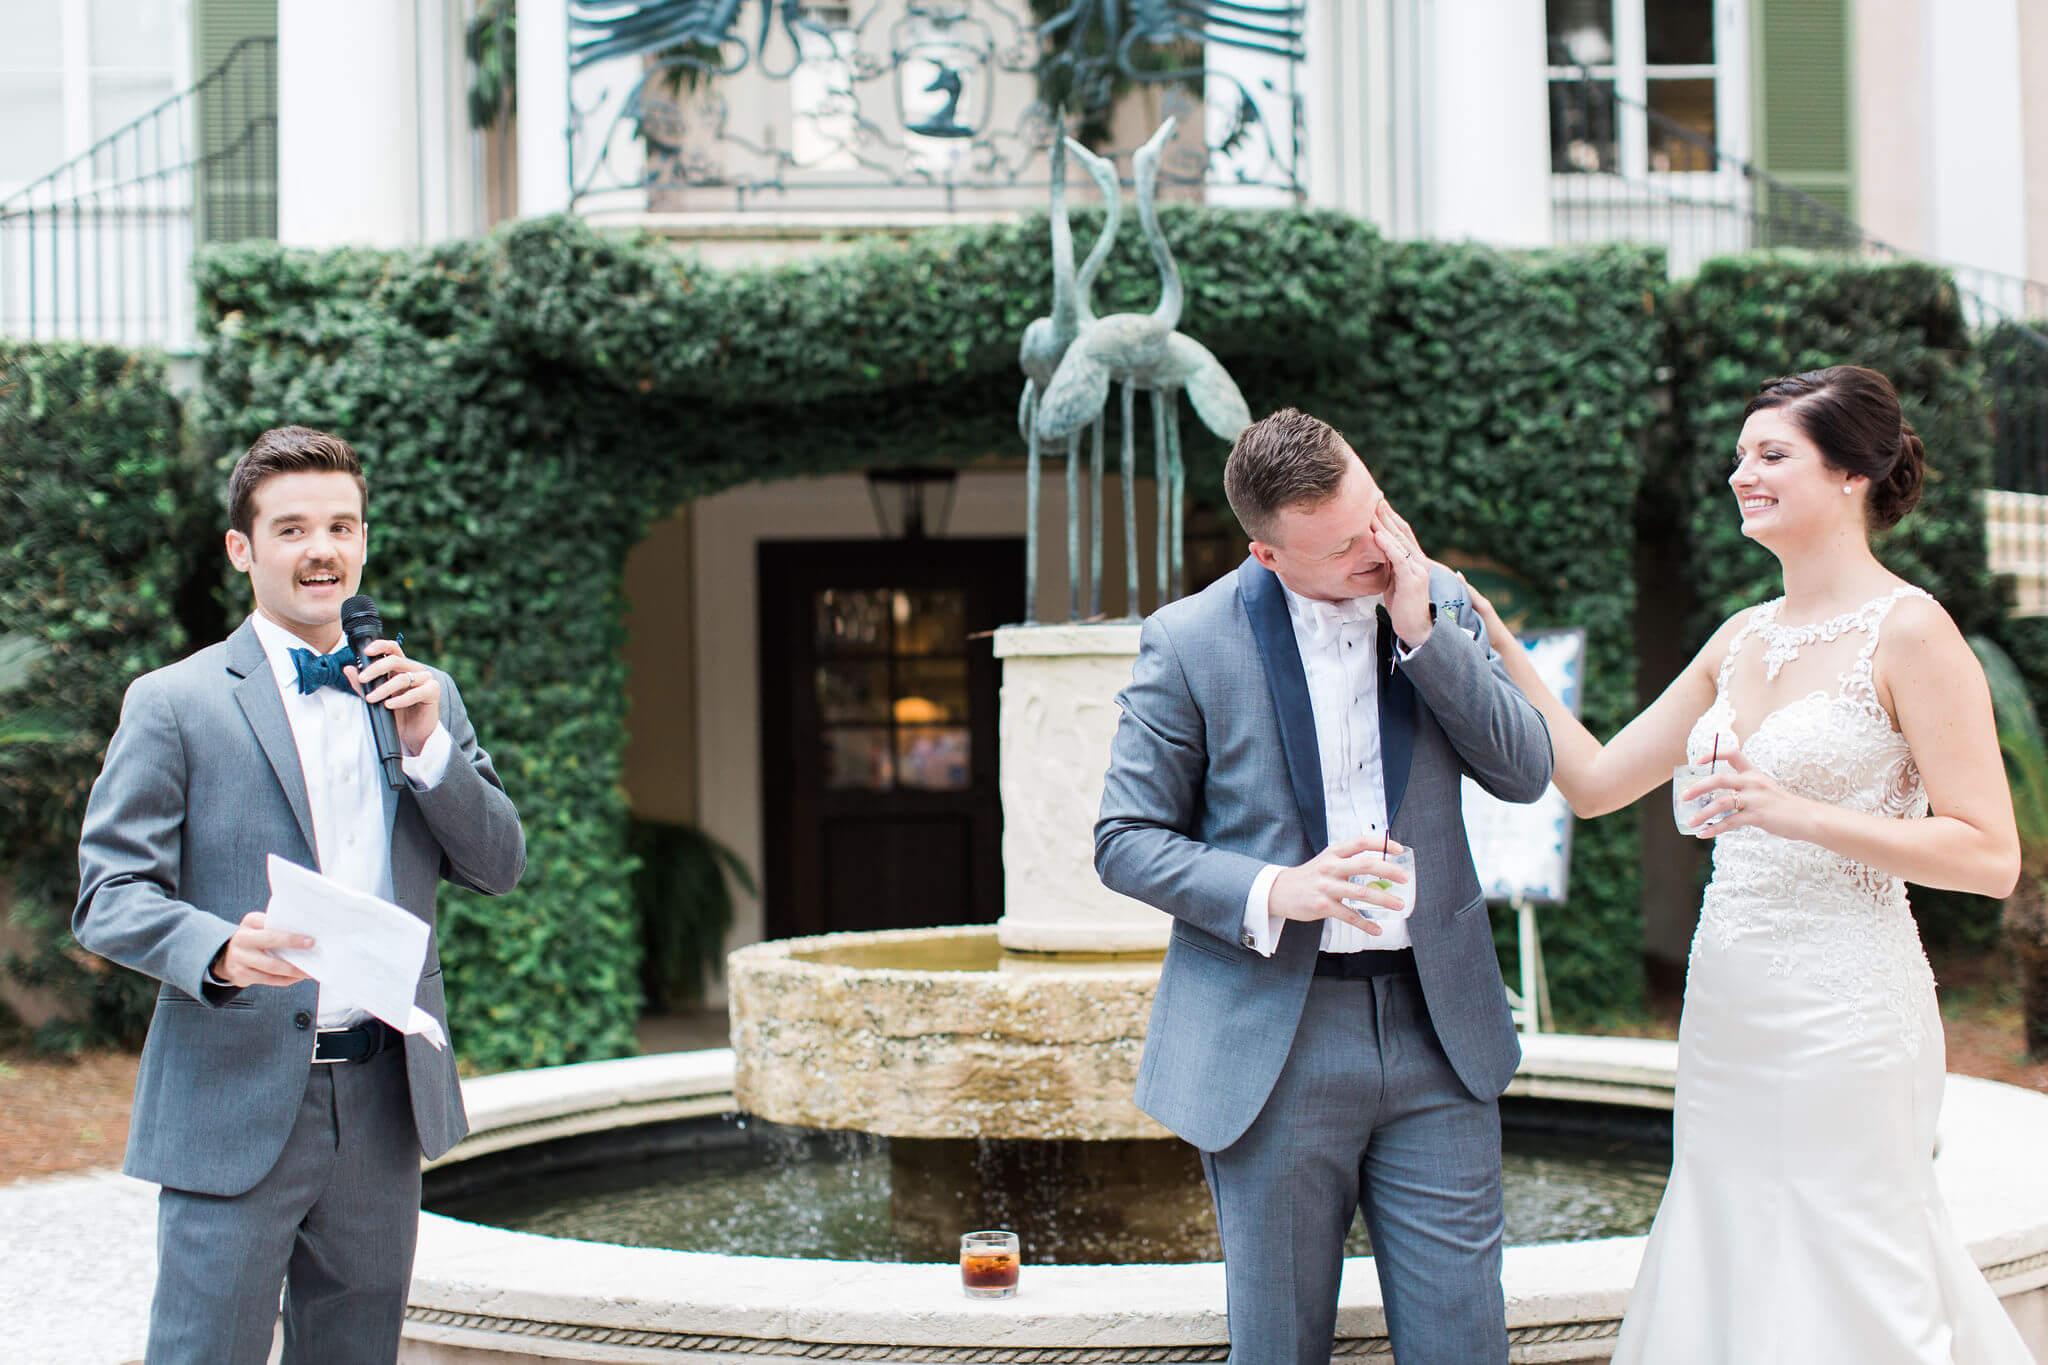 Apt-b-photography-savannah-wedding-photographer-savannah-wedding-hilton-head-wedding-photographer-100.JPG